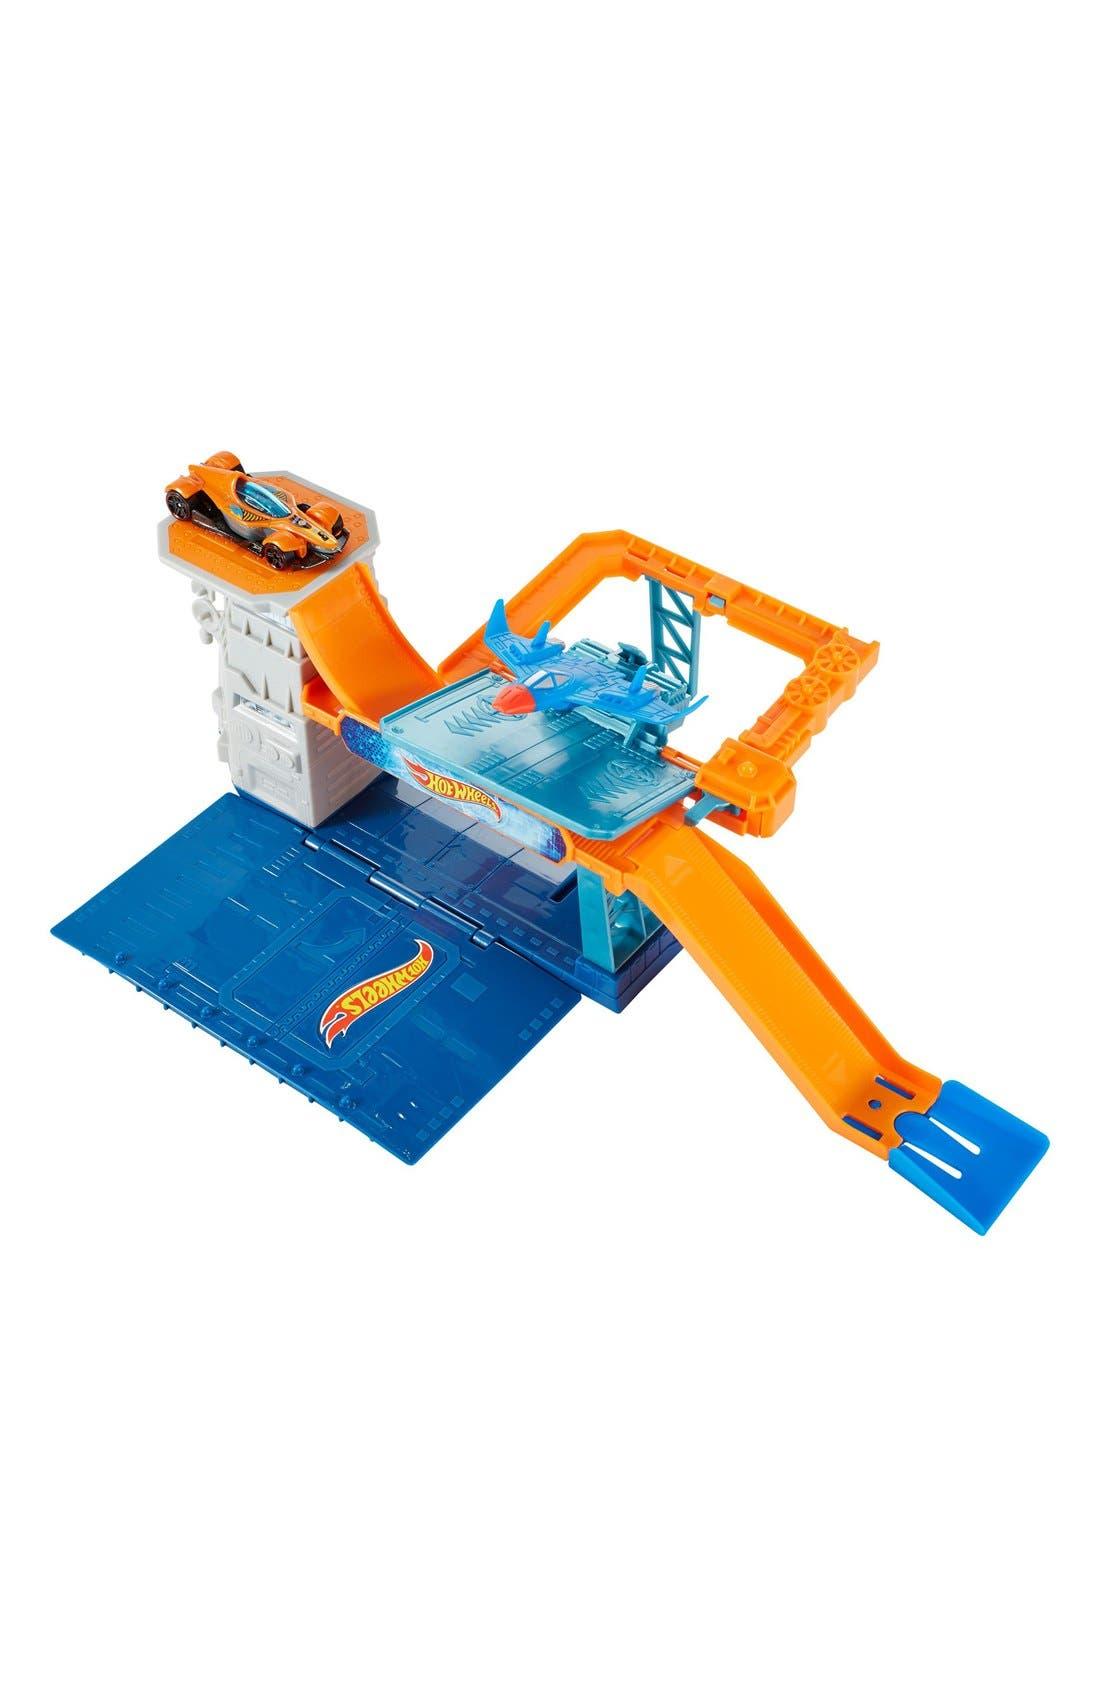 Main Image - Mattel Hot Wheels® Sky-Base Blast™ Play Set